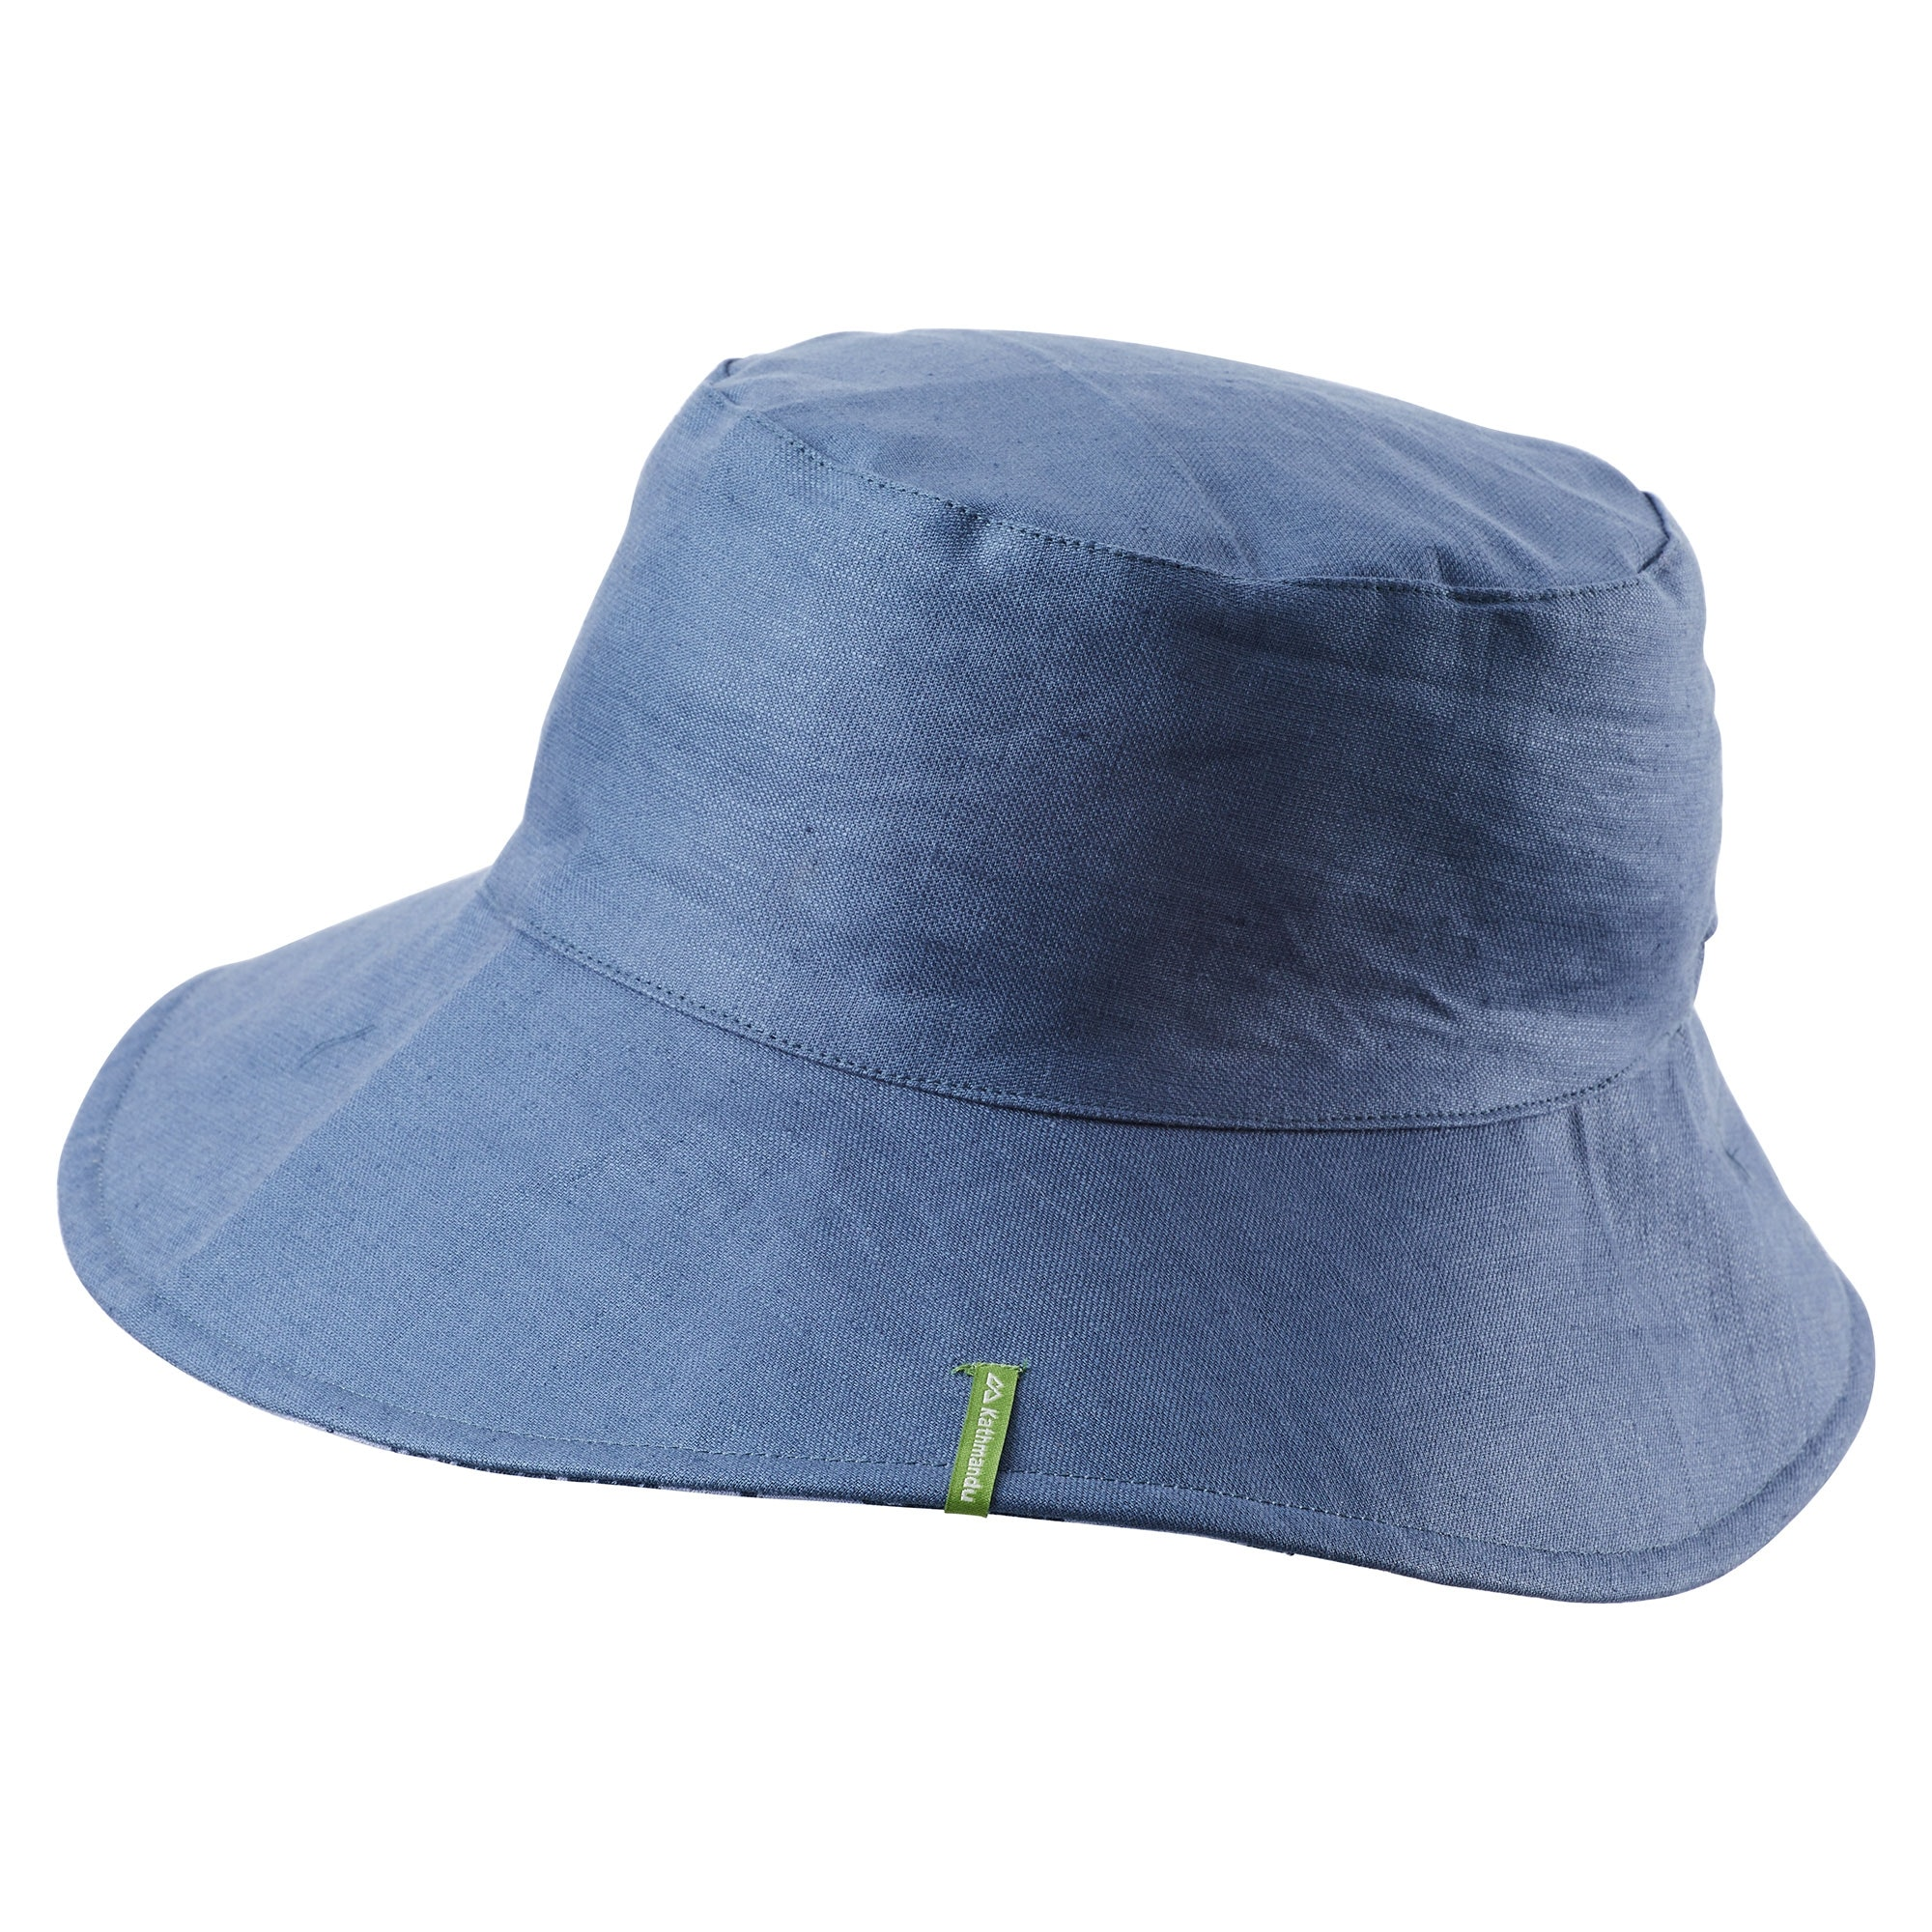 Details about NEW Kathmandu Awna Women s Reversible Adjustable Bucket Sun  Hat Cap 3835b4f2471